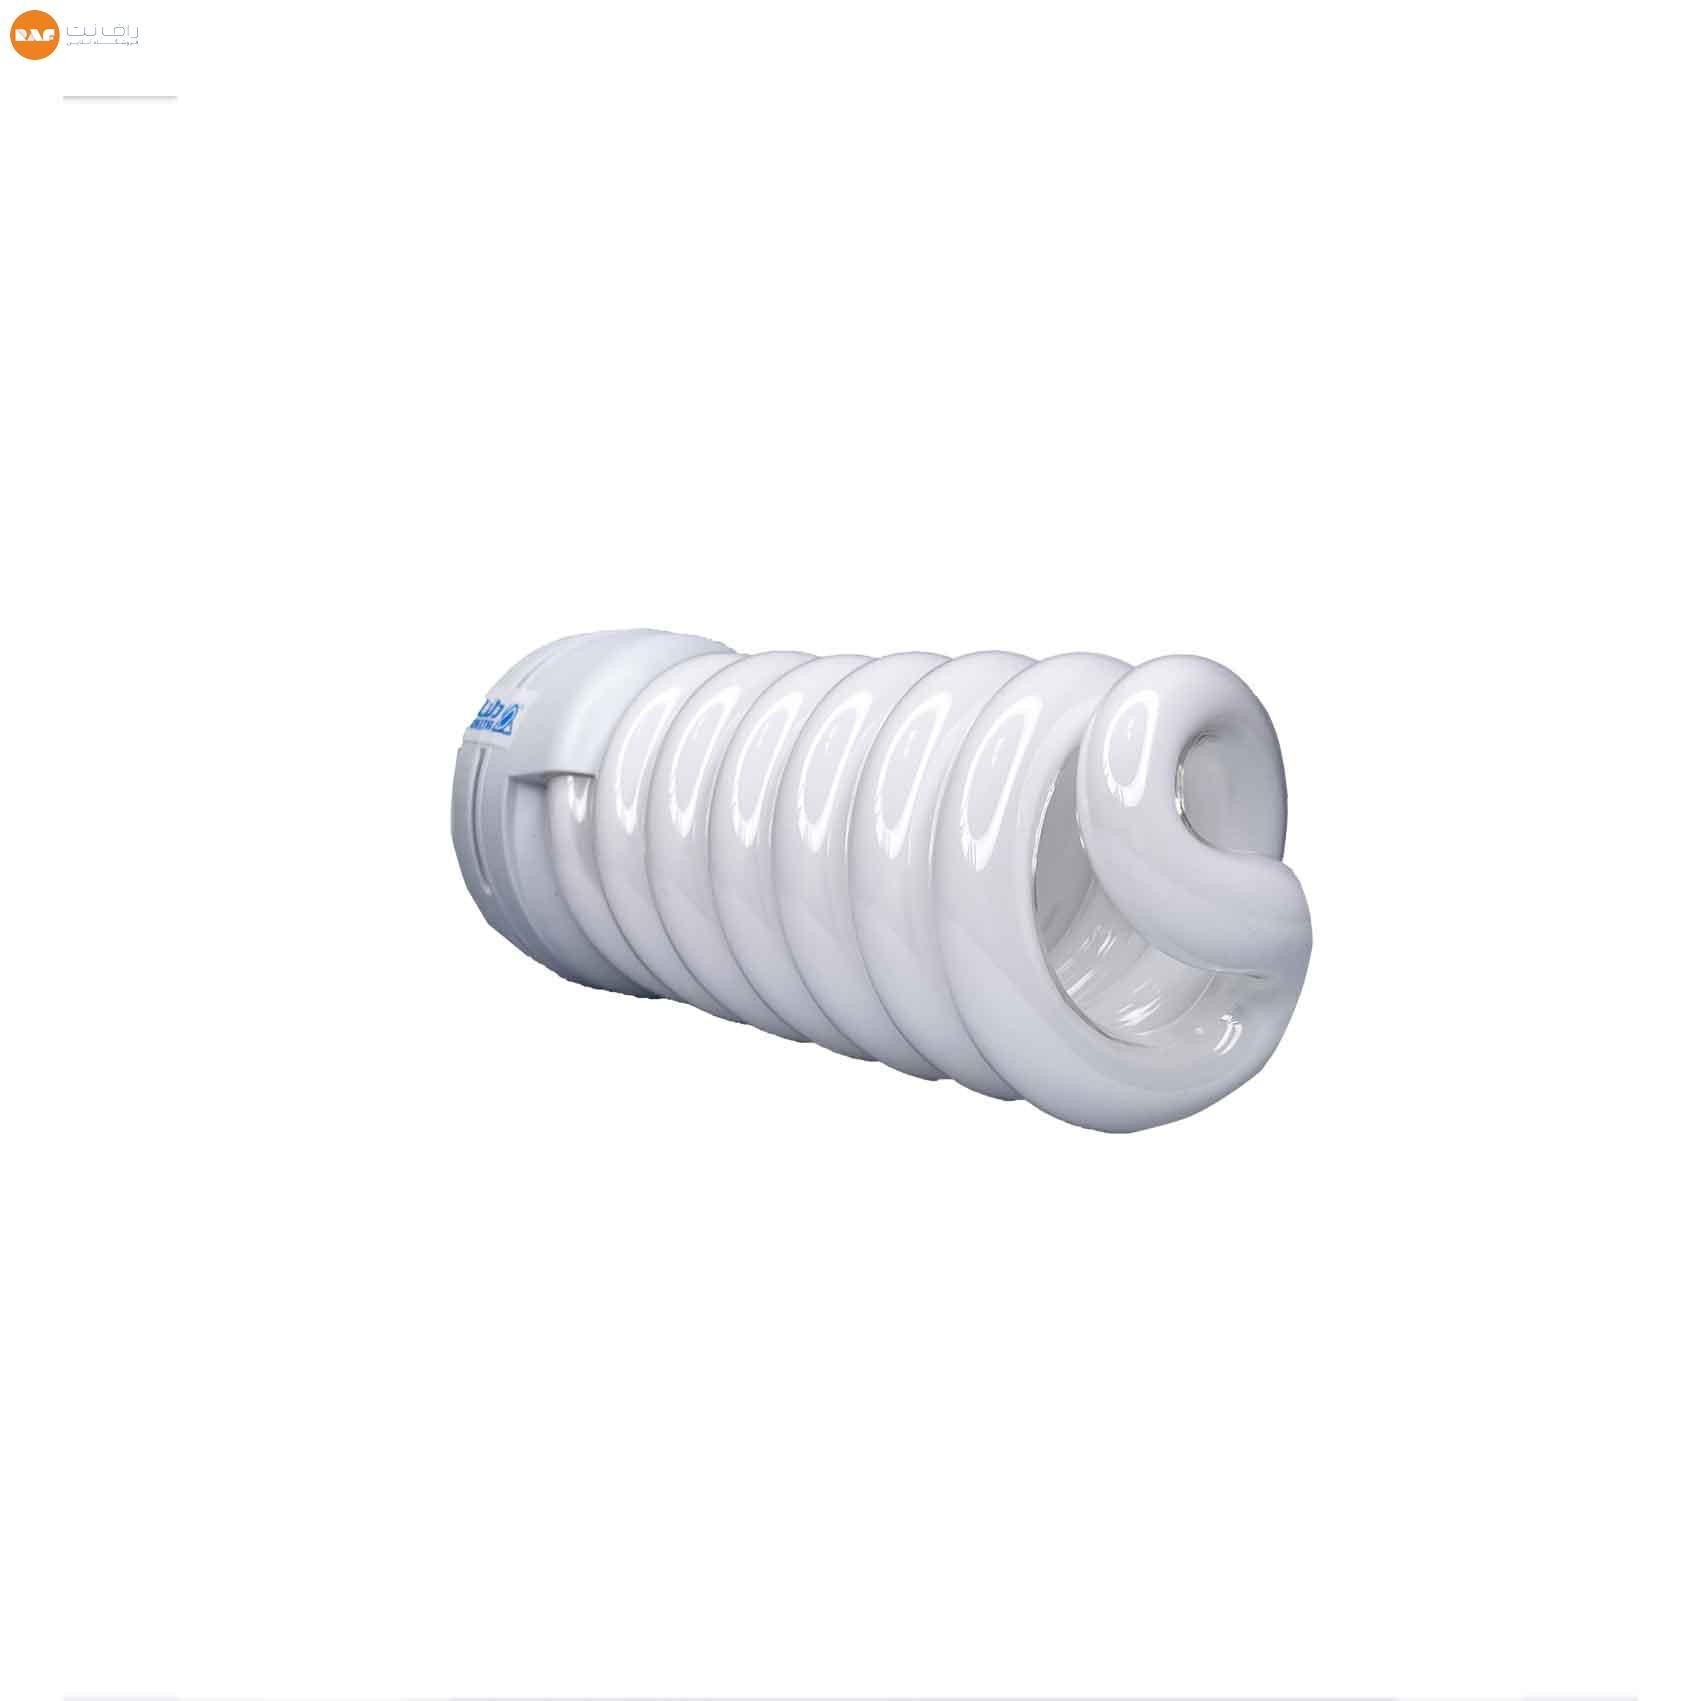 لامپ کم مصرف 80 وات دلتا مدل تمام پیچ پایه E27